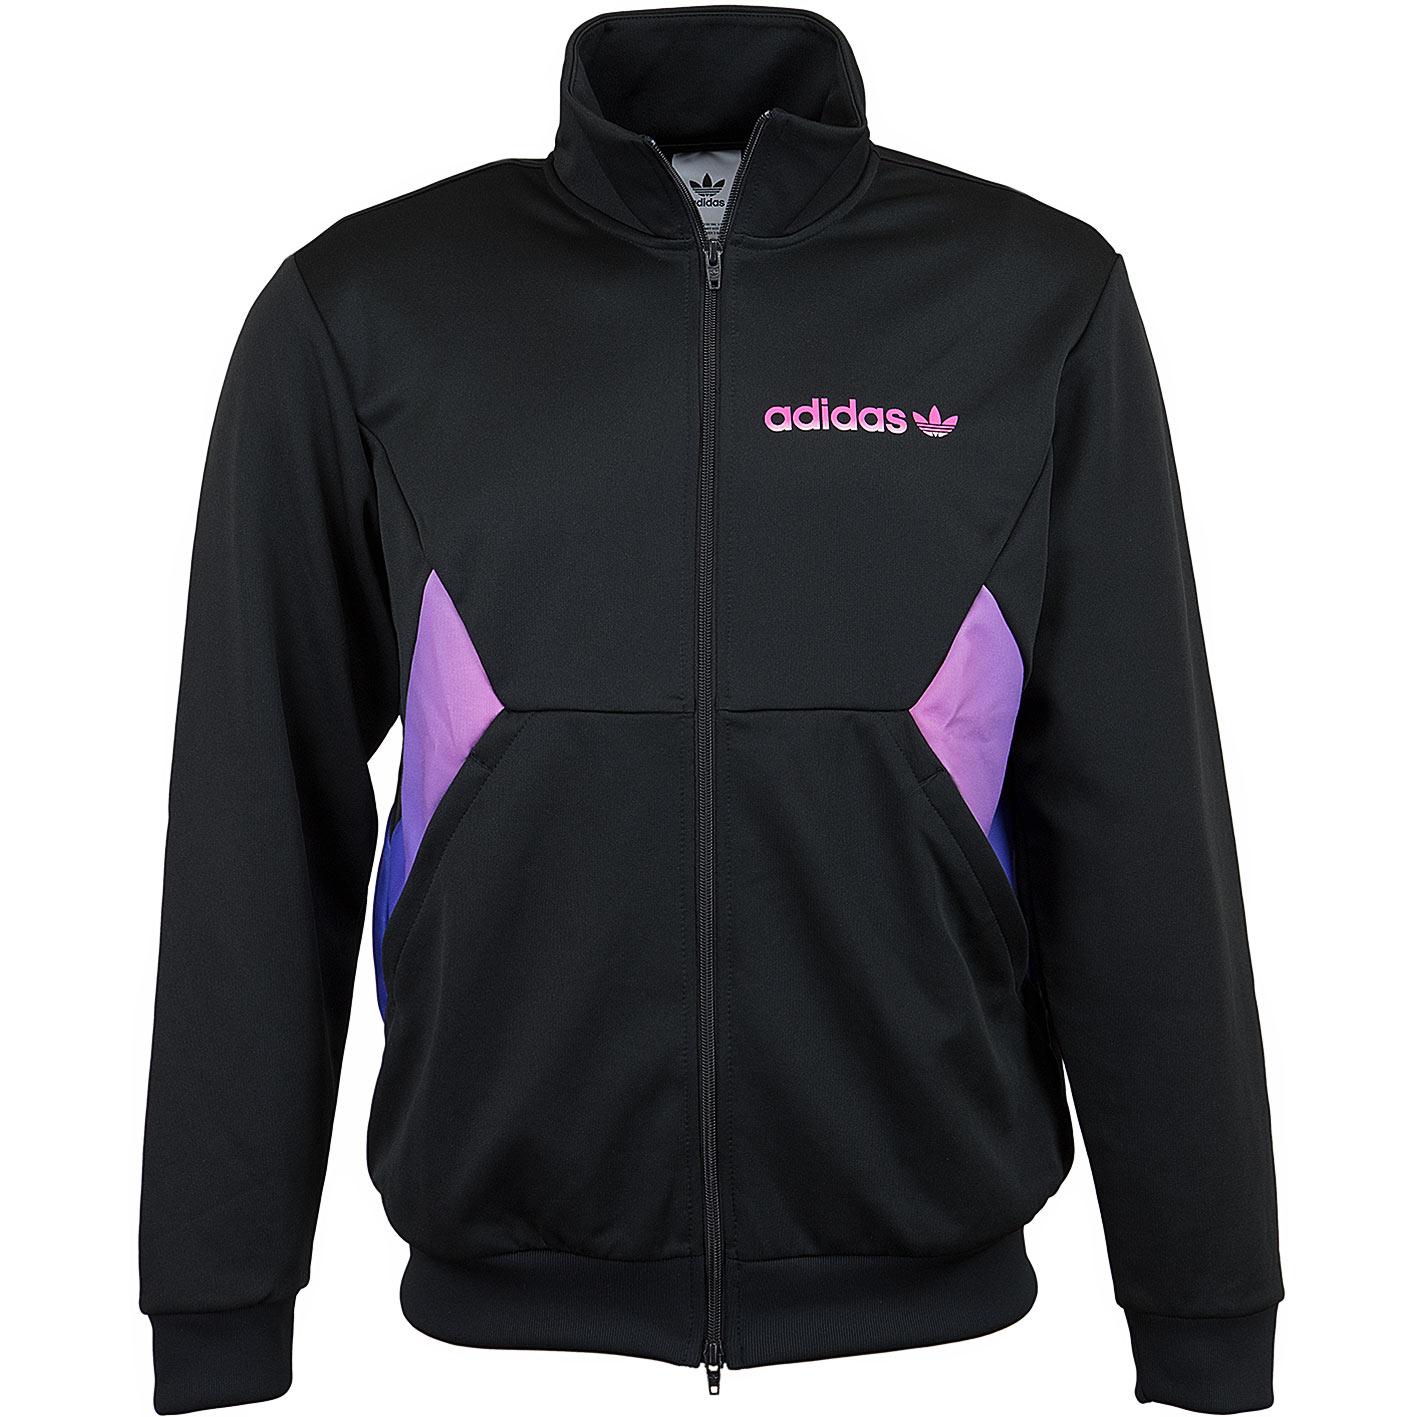 Pavimentación Rocío collar  ☆ Adidas Originals Trainingsjacke Degrade schwarz - hier bestellen!